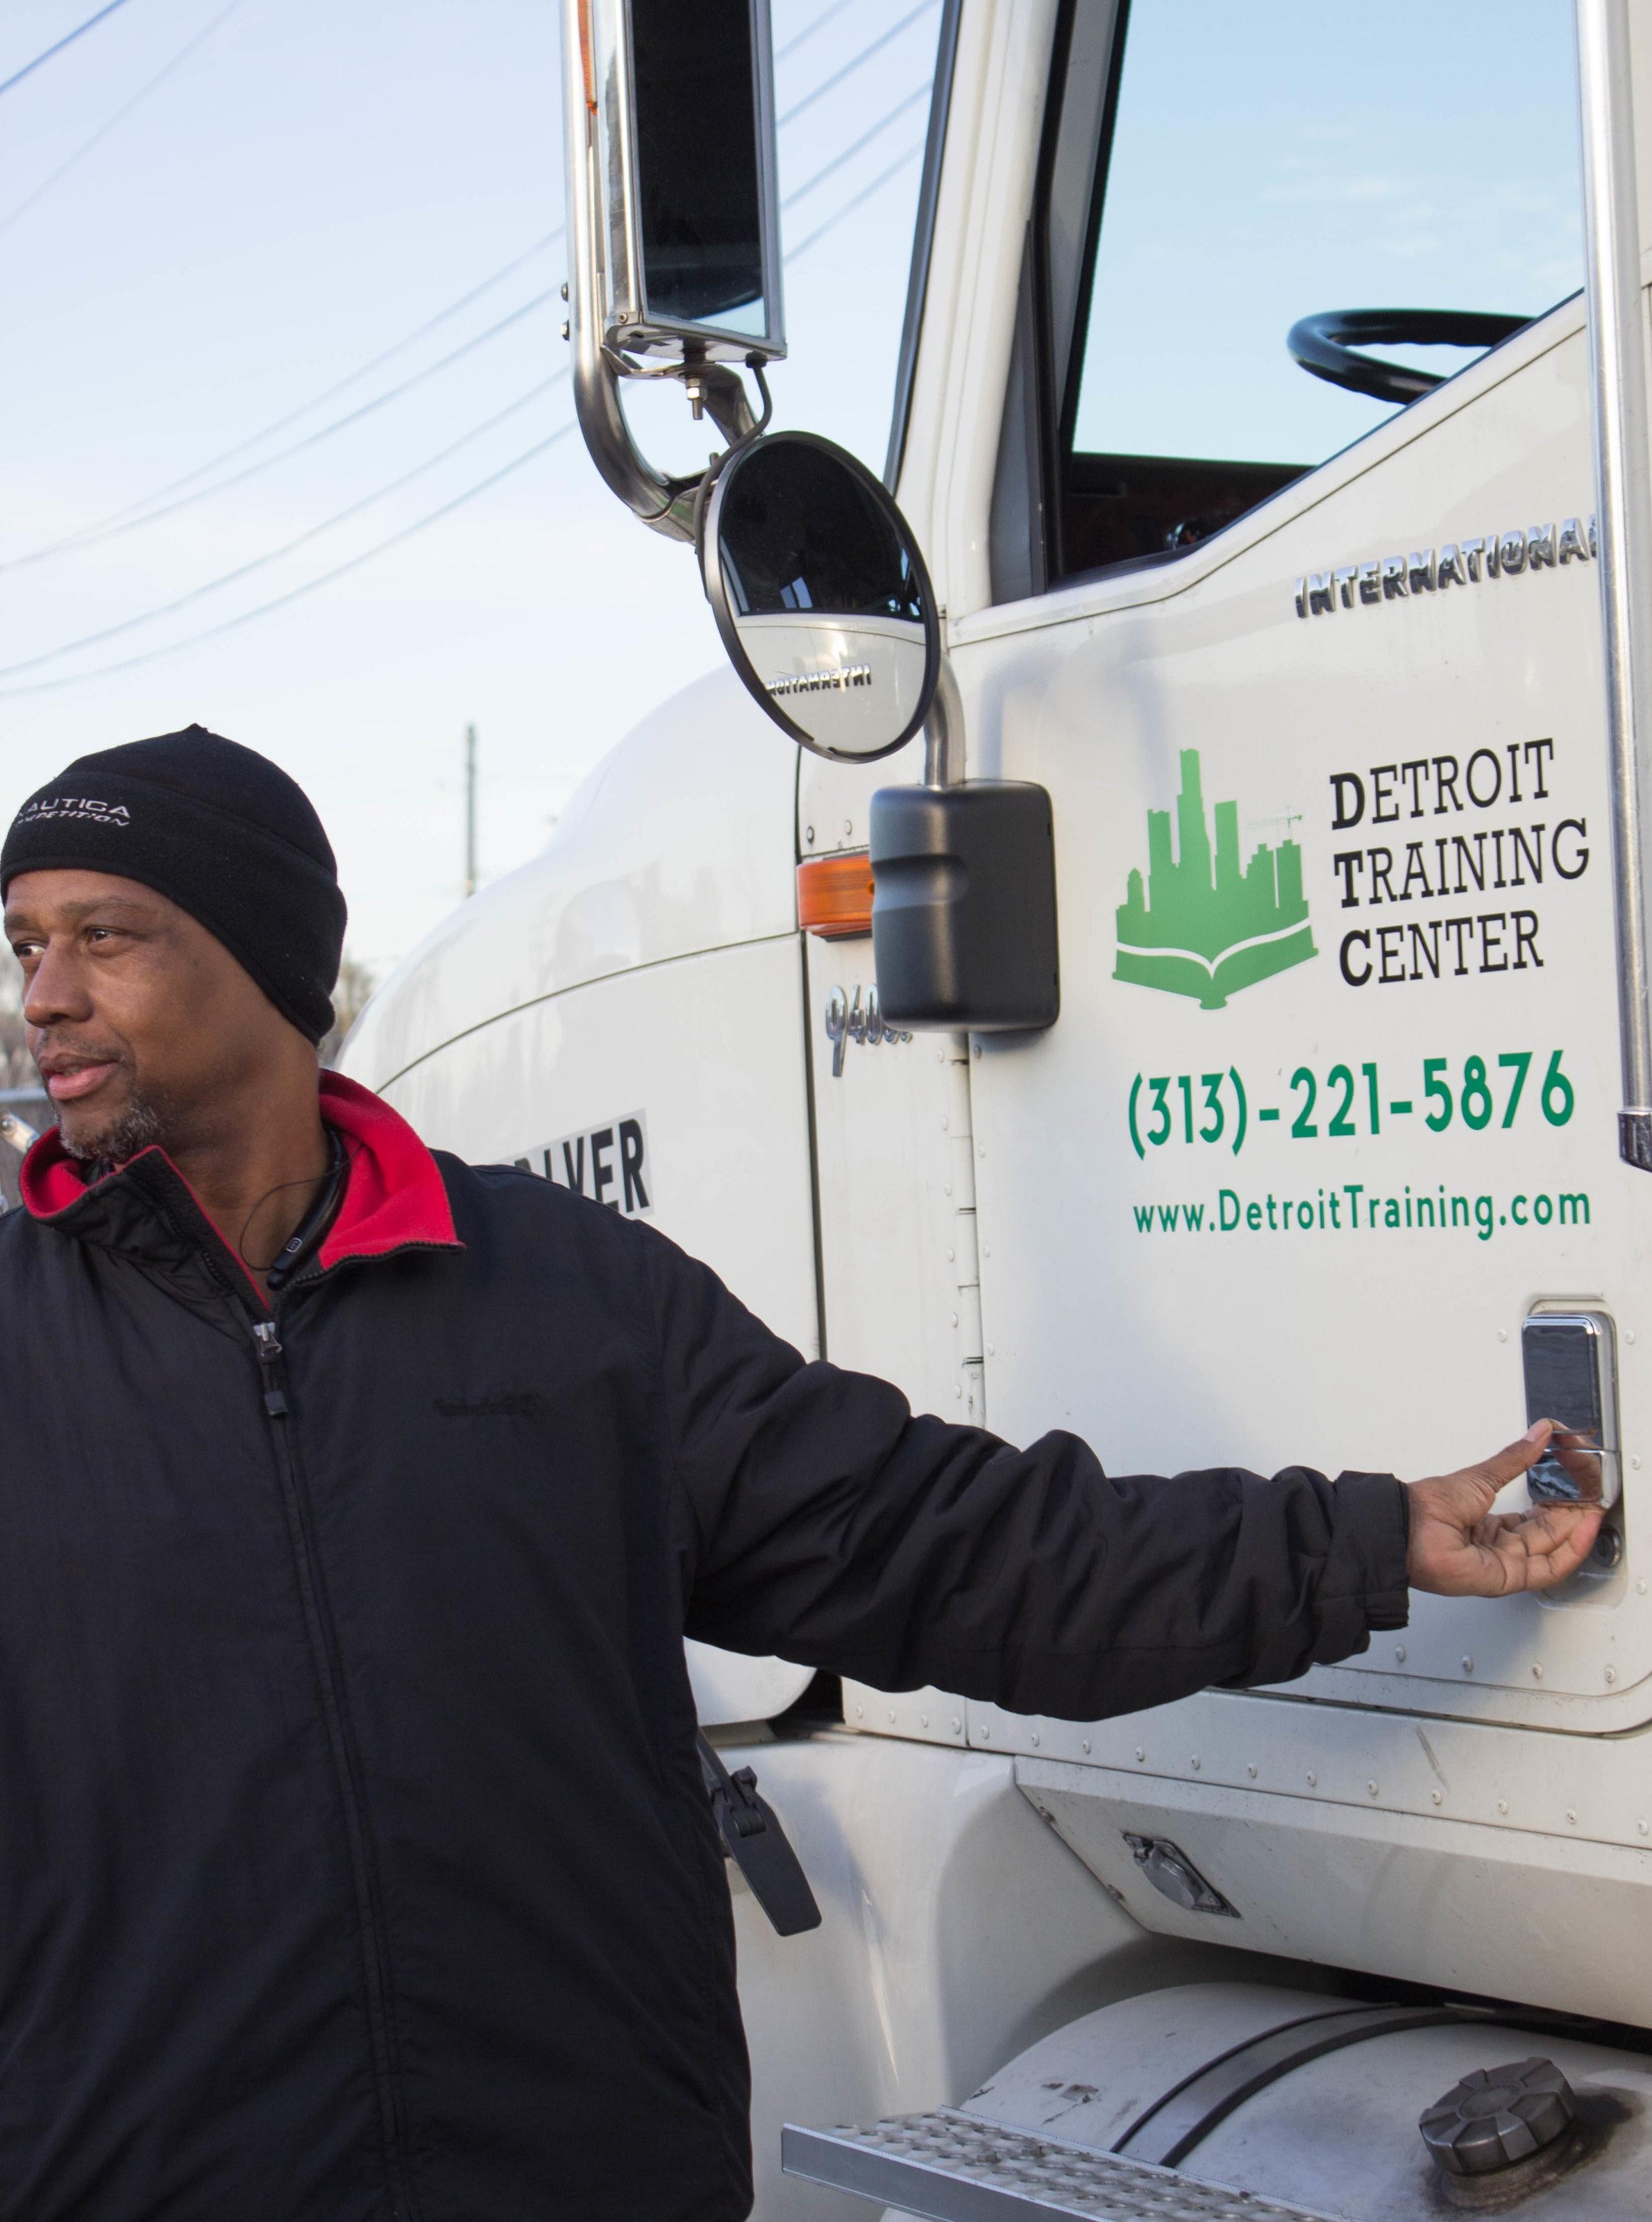 cdl-truck-driver-training-job-detroit-construction-license